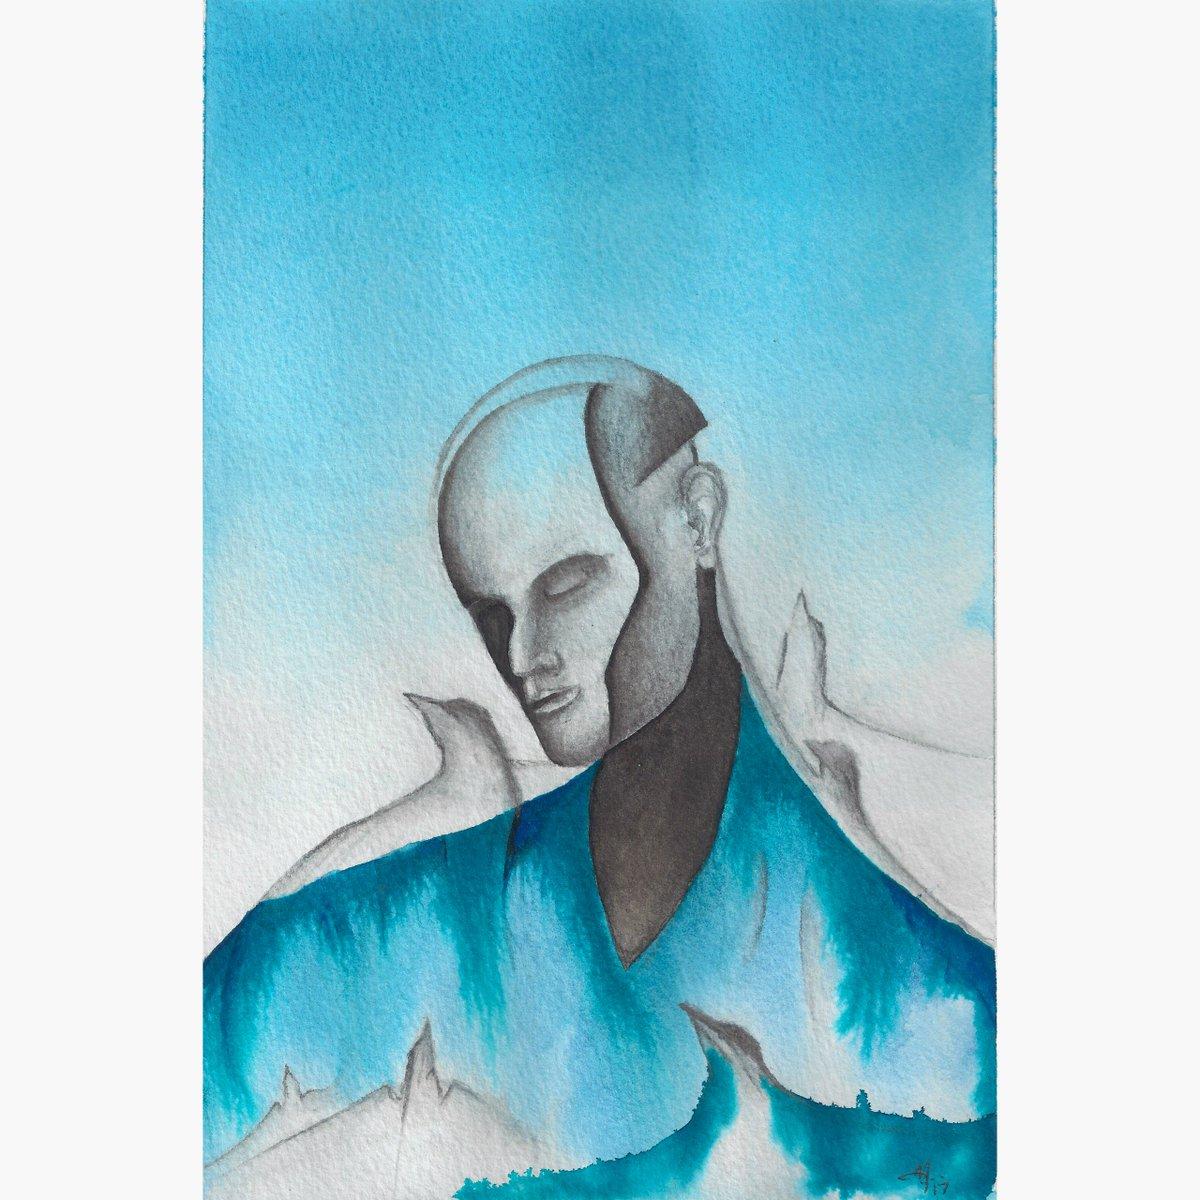 Through #watercolor - 26-17 cm. Celeste Series #painting #watercolour #omxart #deephouse #techno #dance #contemporary #art #PrideMonth <br>http://pic.twitter.com/yY5UP7RCwq